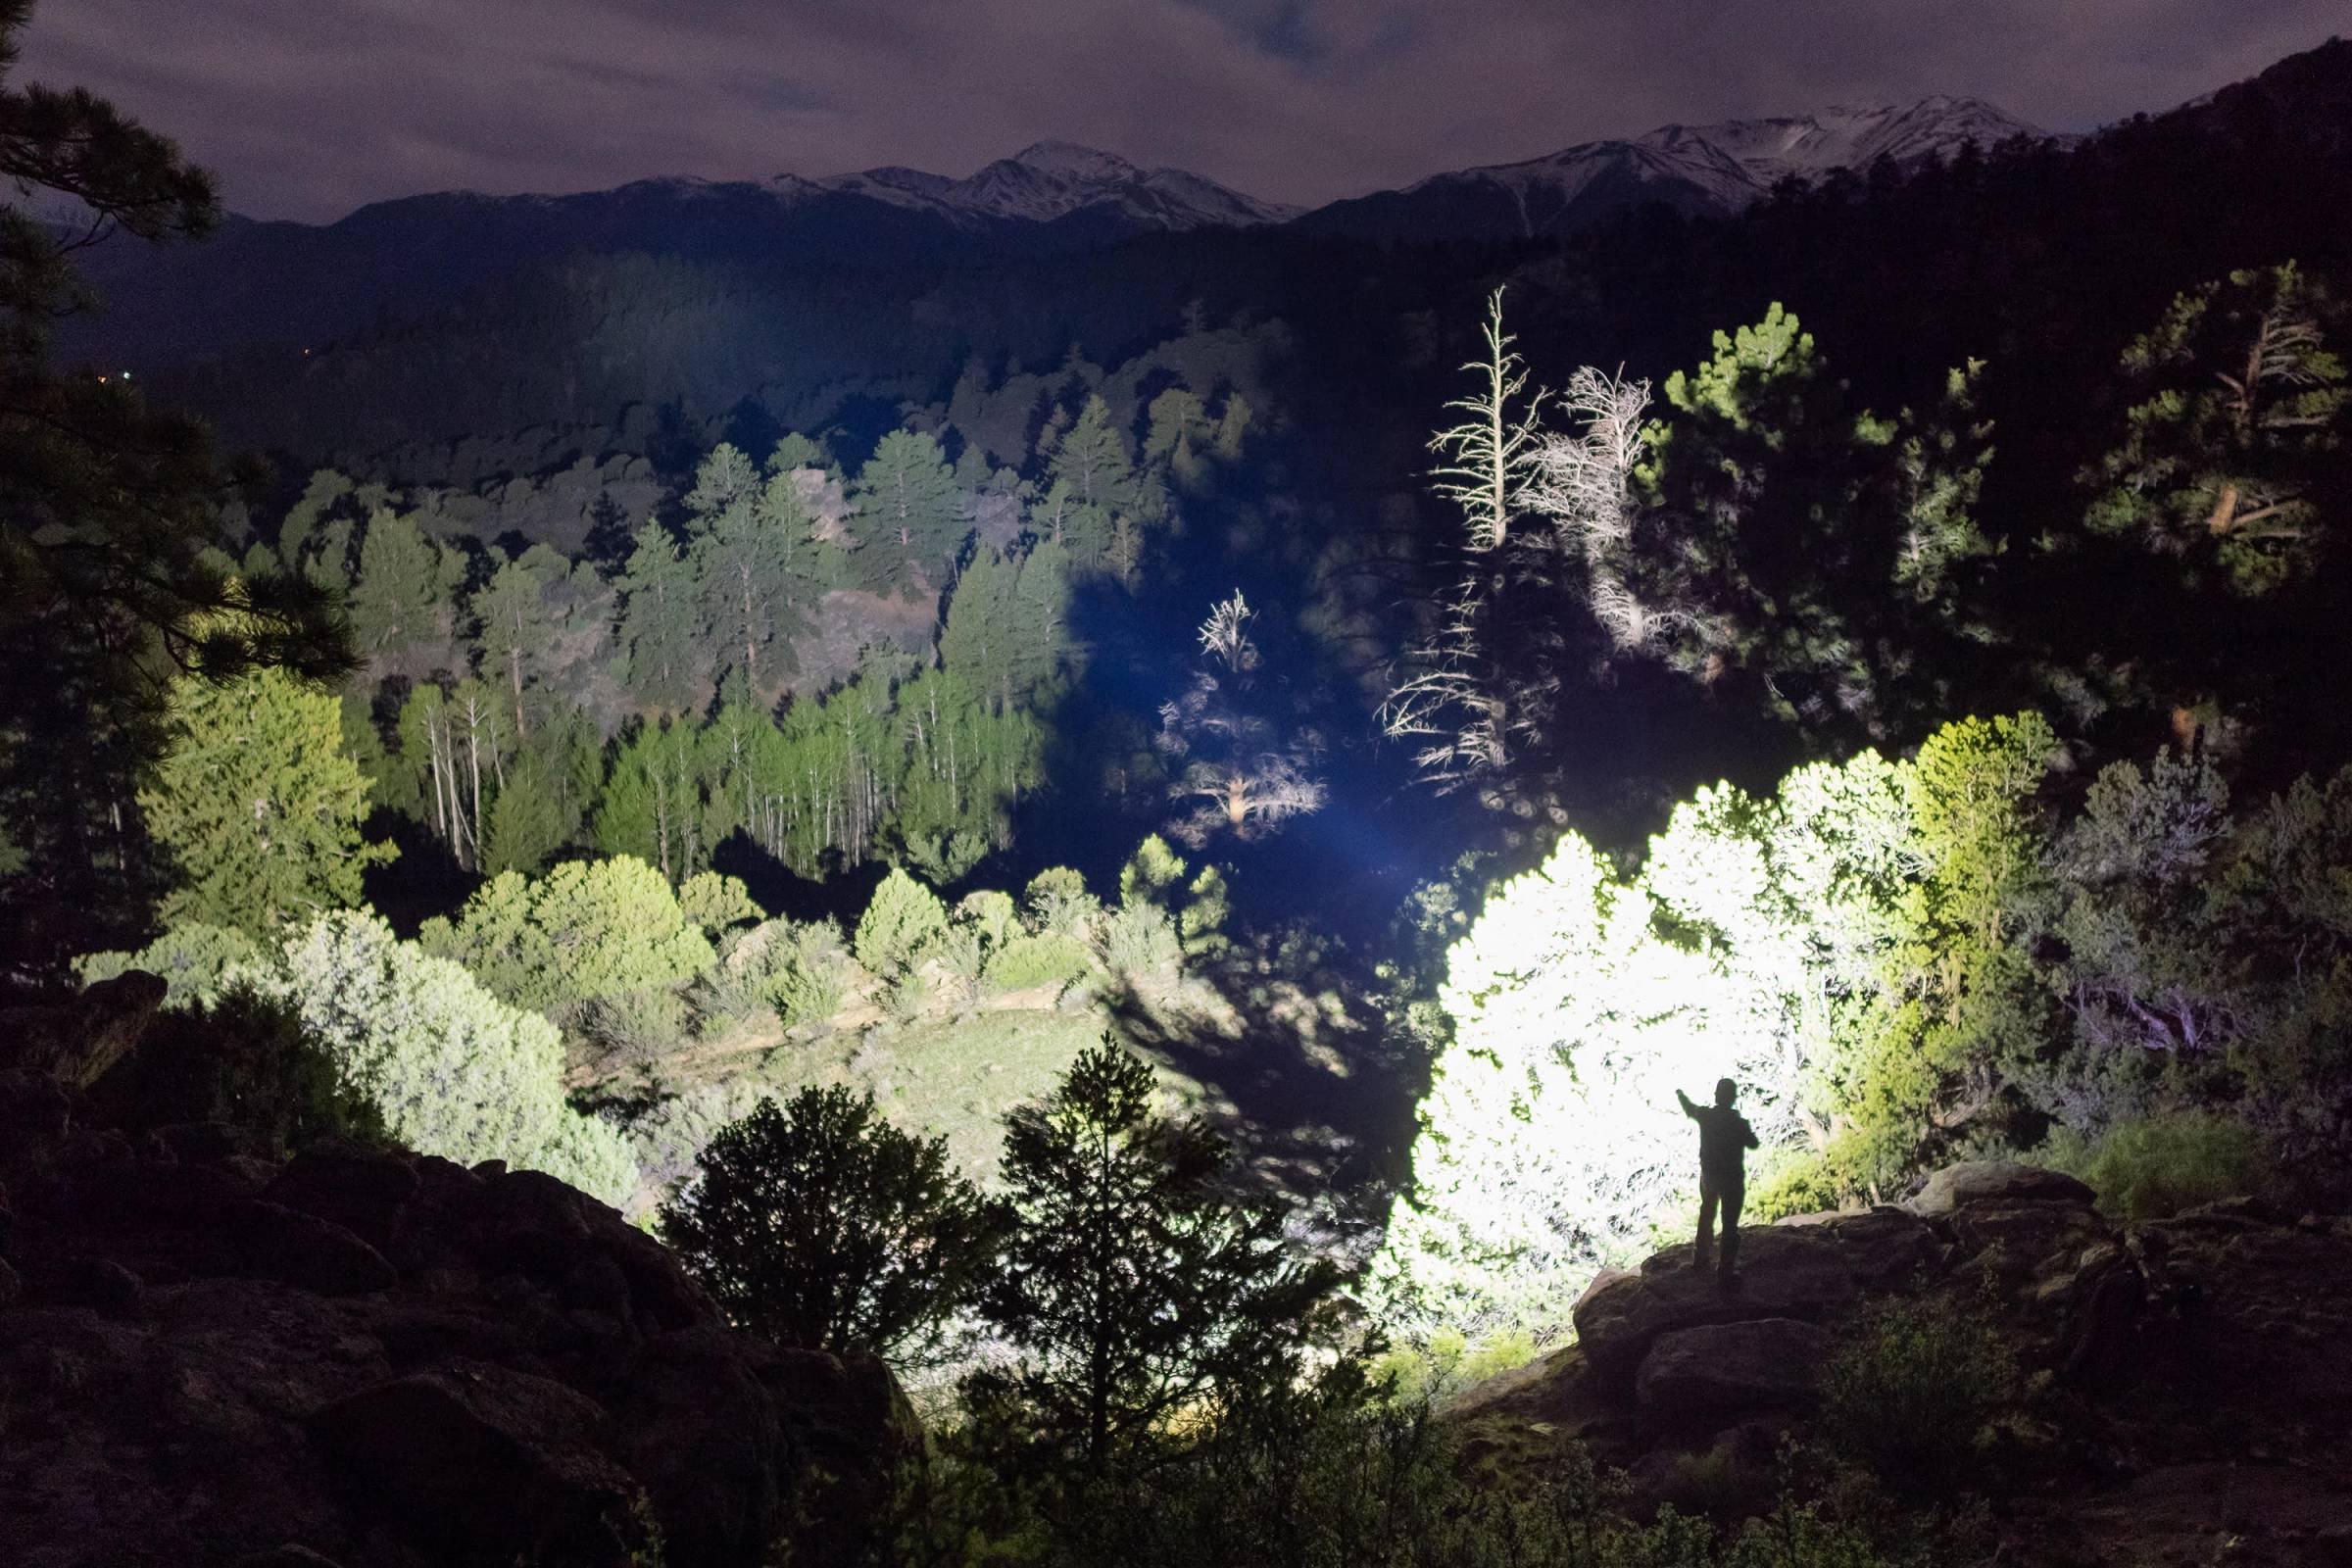 Fenix-lighting-headlamps-brightest-lumens